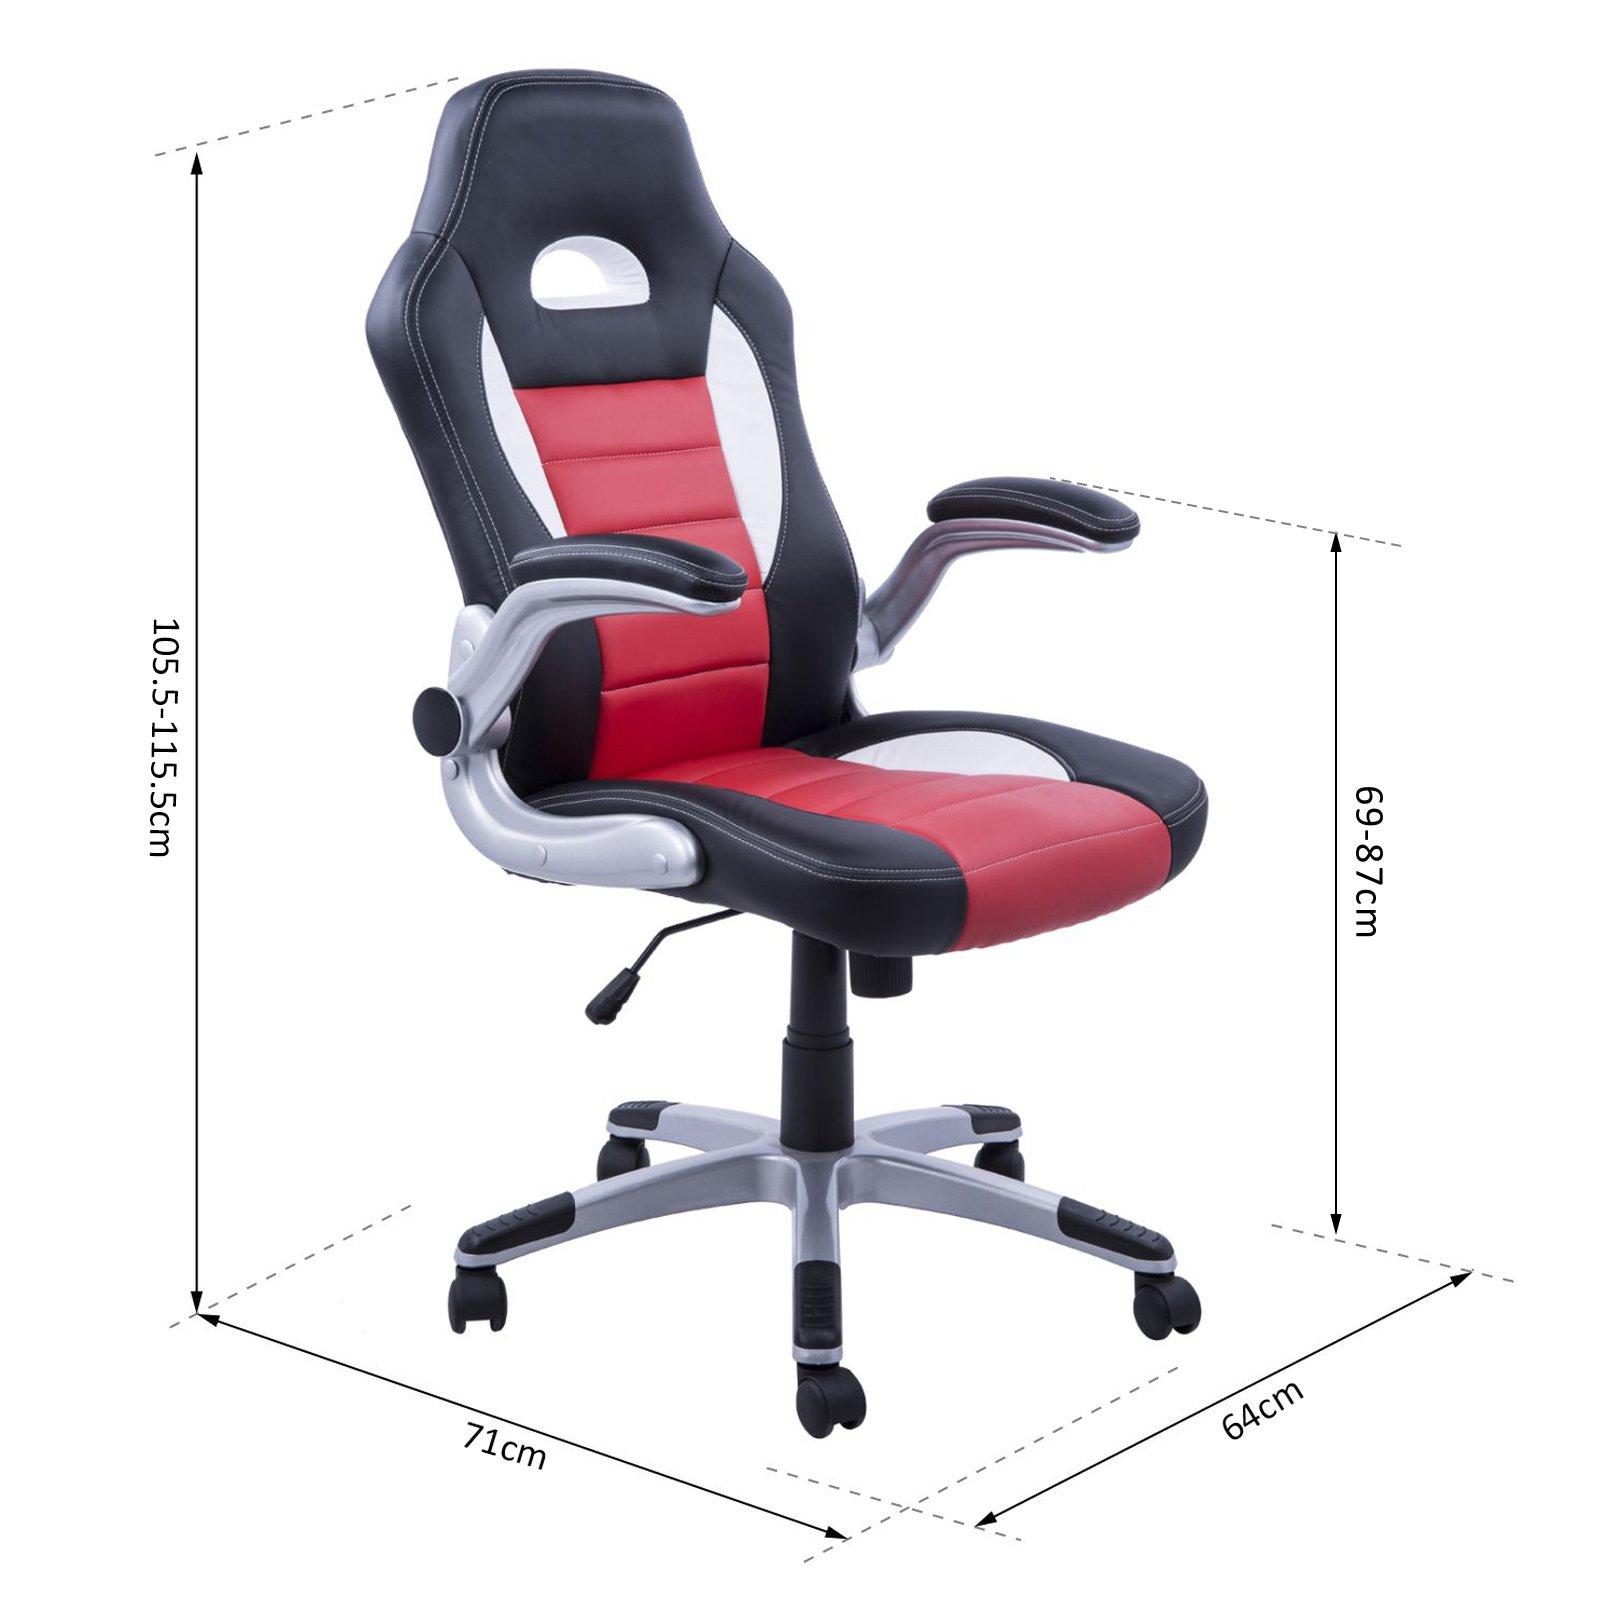 Silla de Oficina Racing Deportiva para Despacho tipo Silla Ejecutiva modo  giratorio Negro Rojo Bla